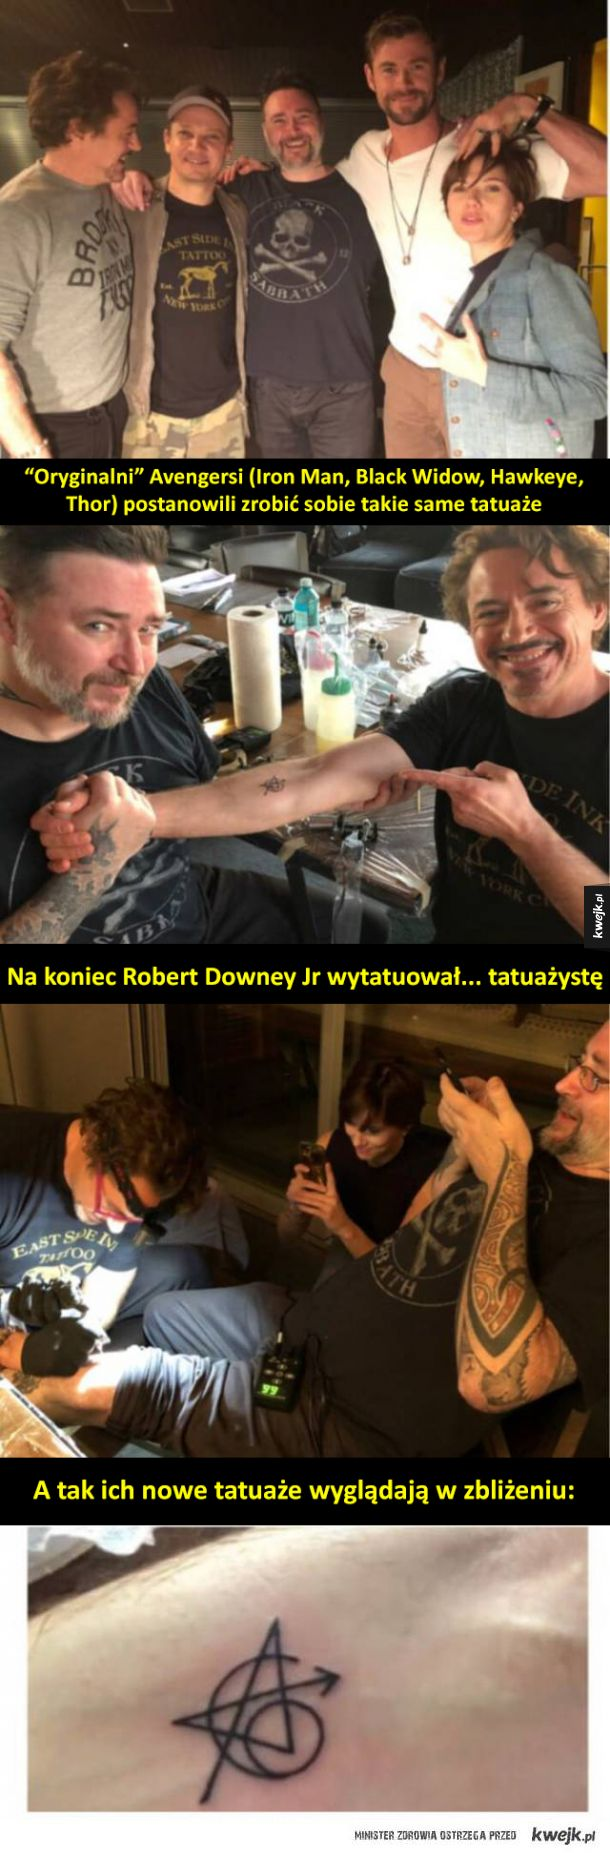 Avengersi mają teraz takie same tatuaże